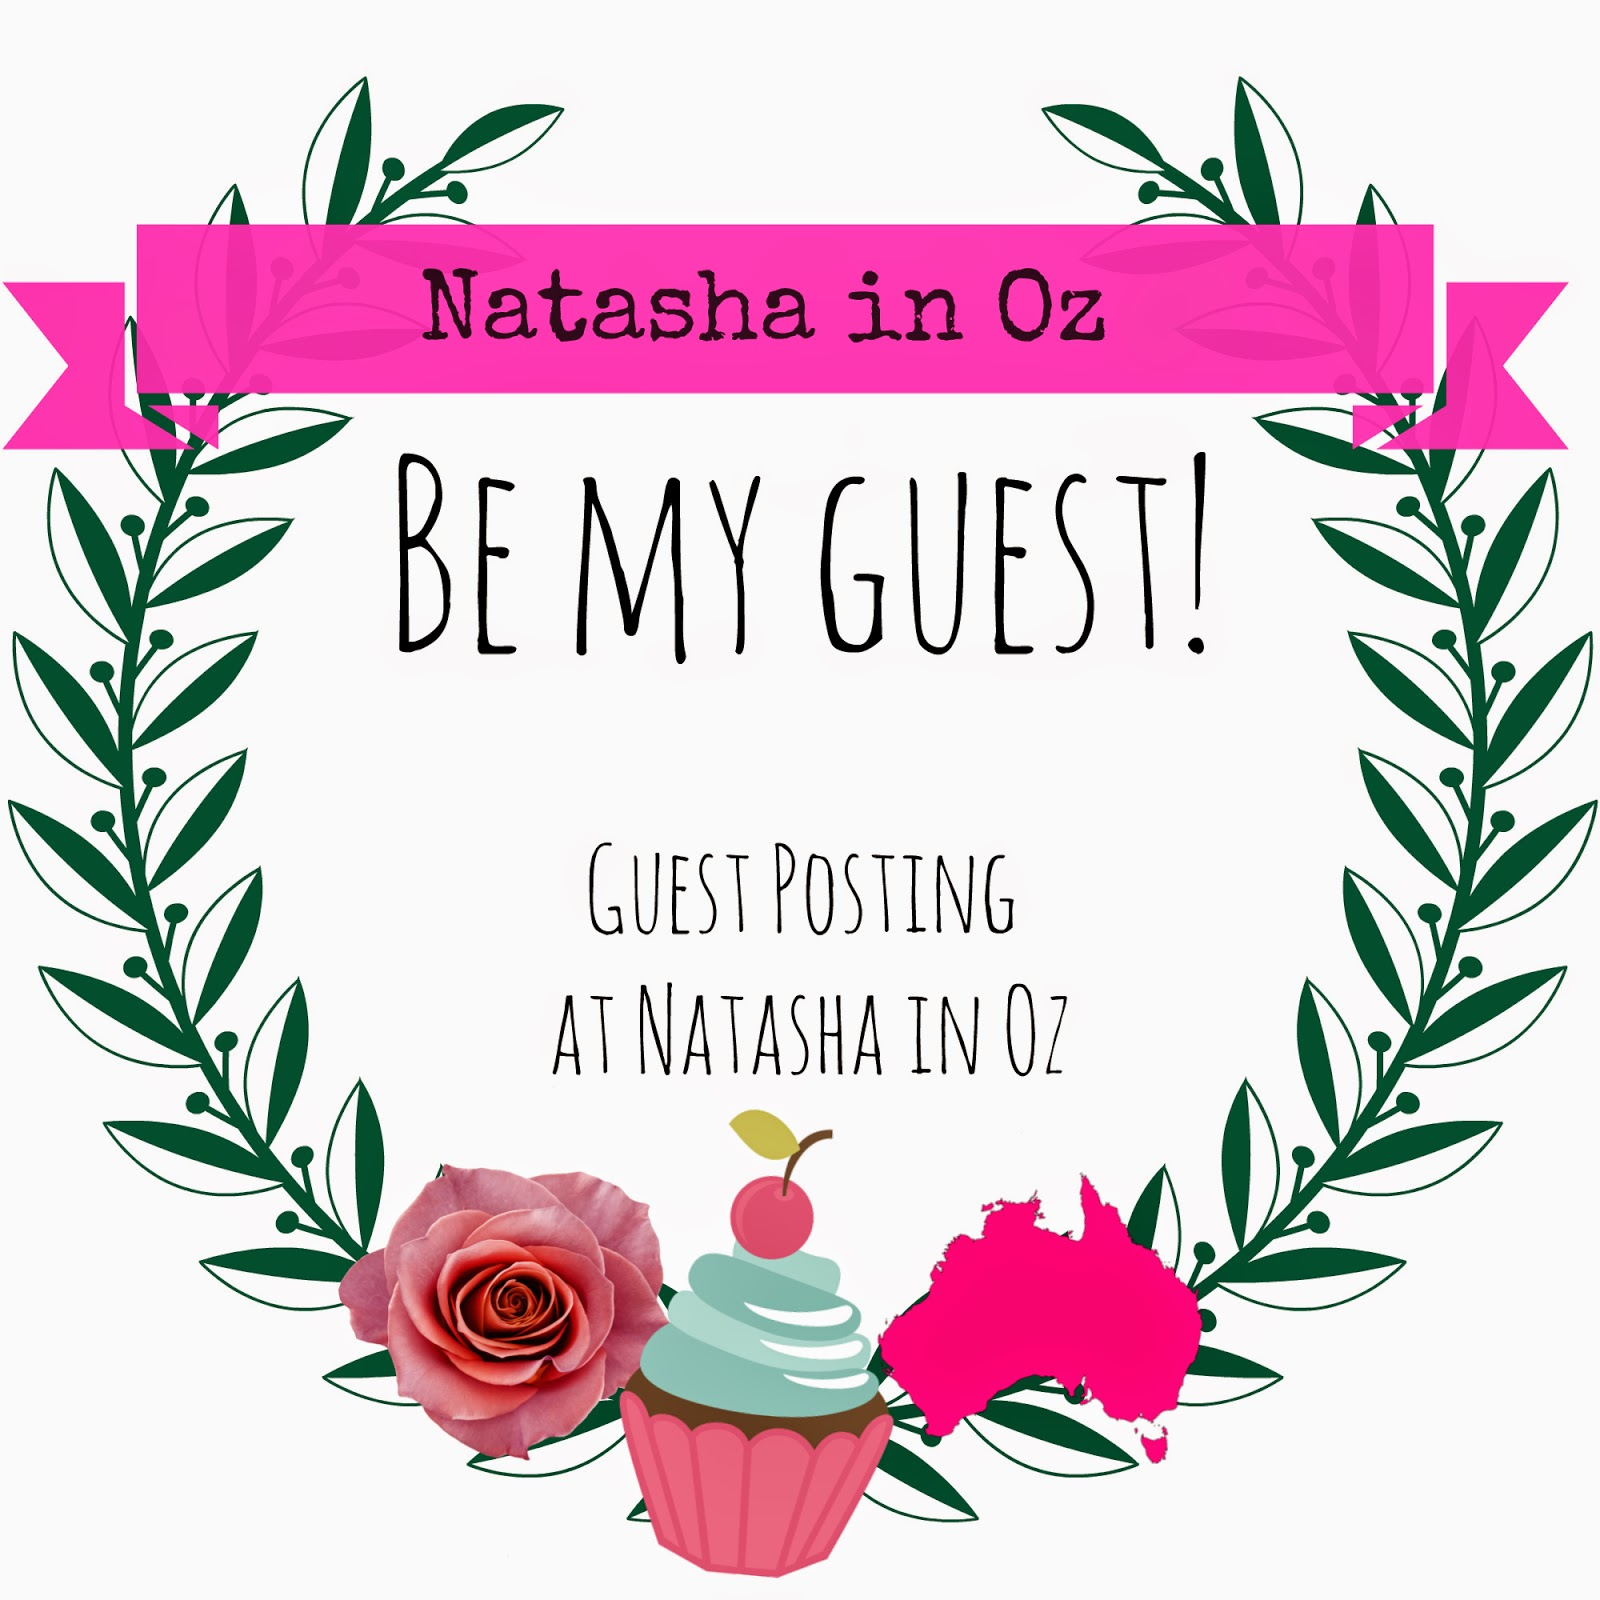 Guest Posting @ Natasha in Oz